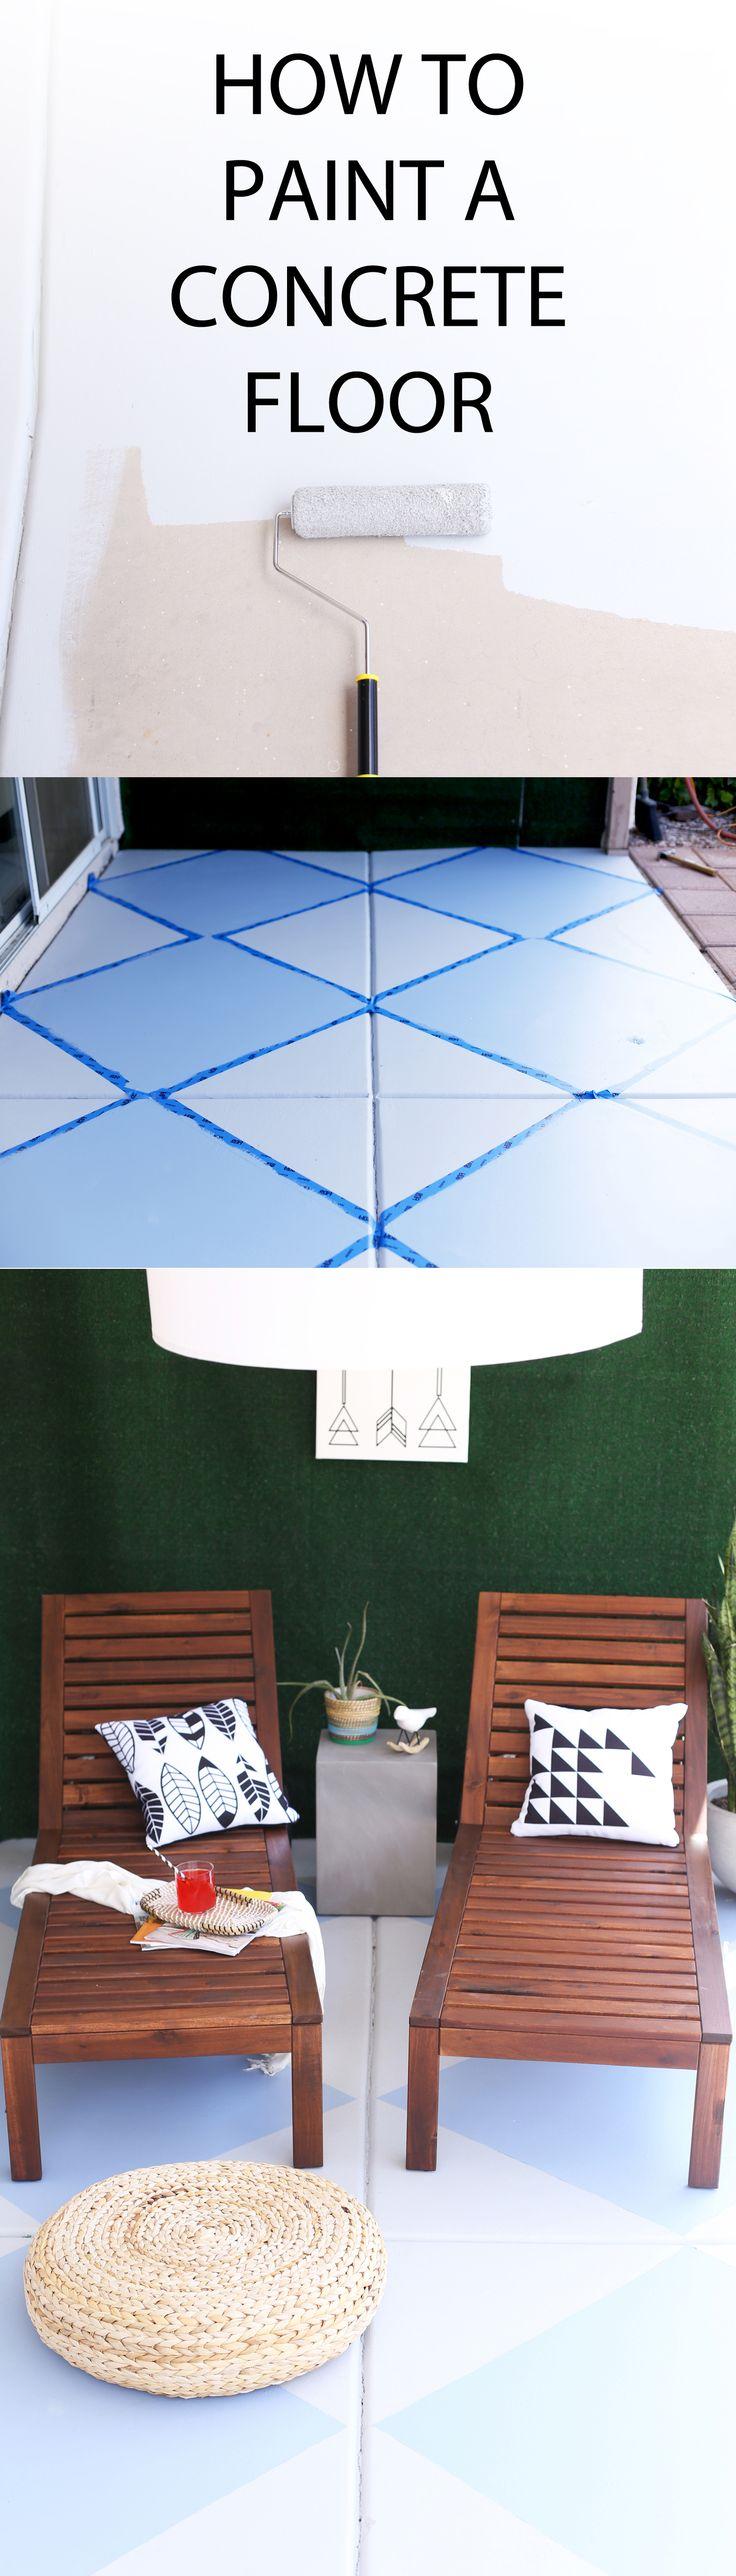 how to paint a diamond pattern on an outdoor patio concrete floor | Kristi Murphy